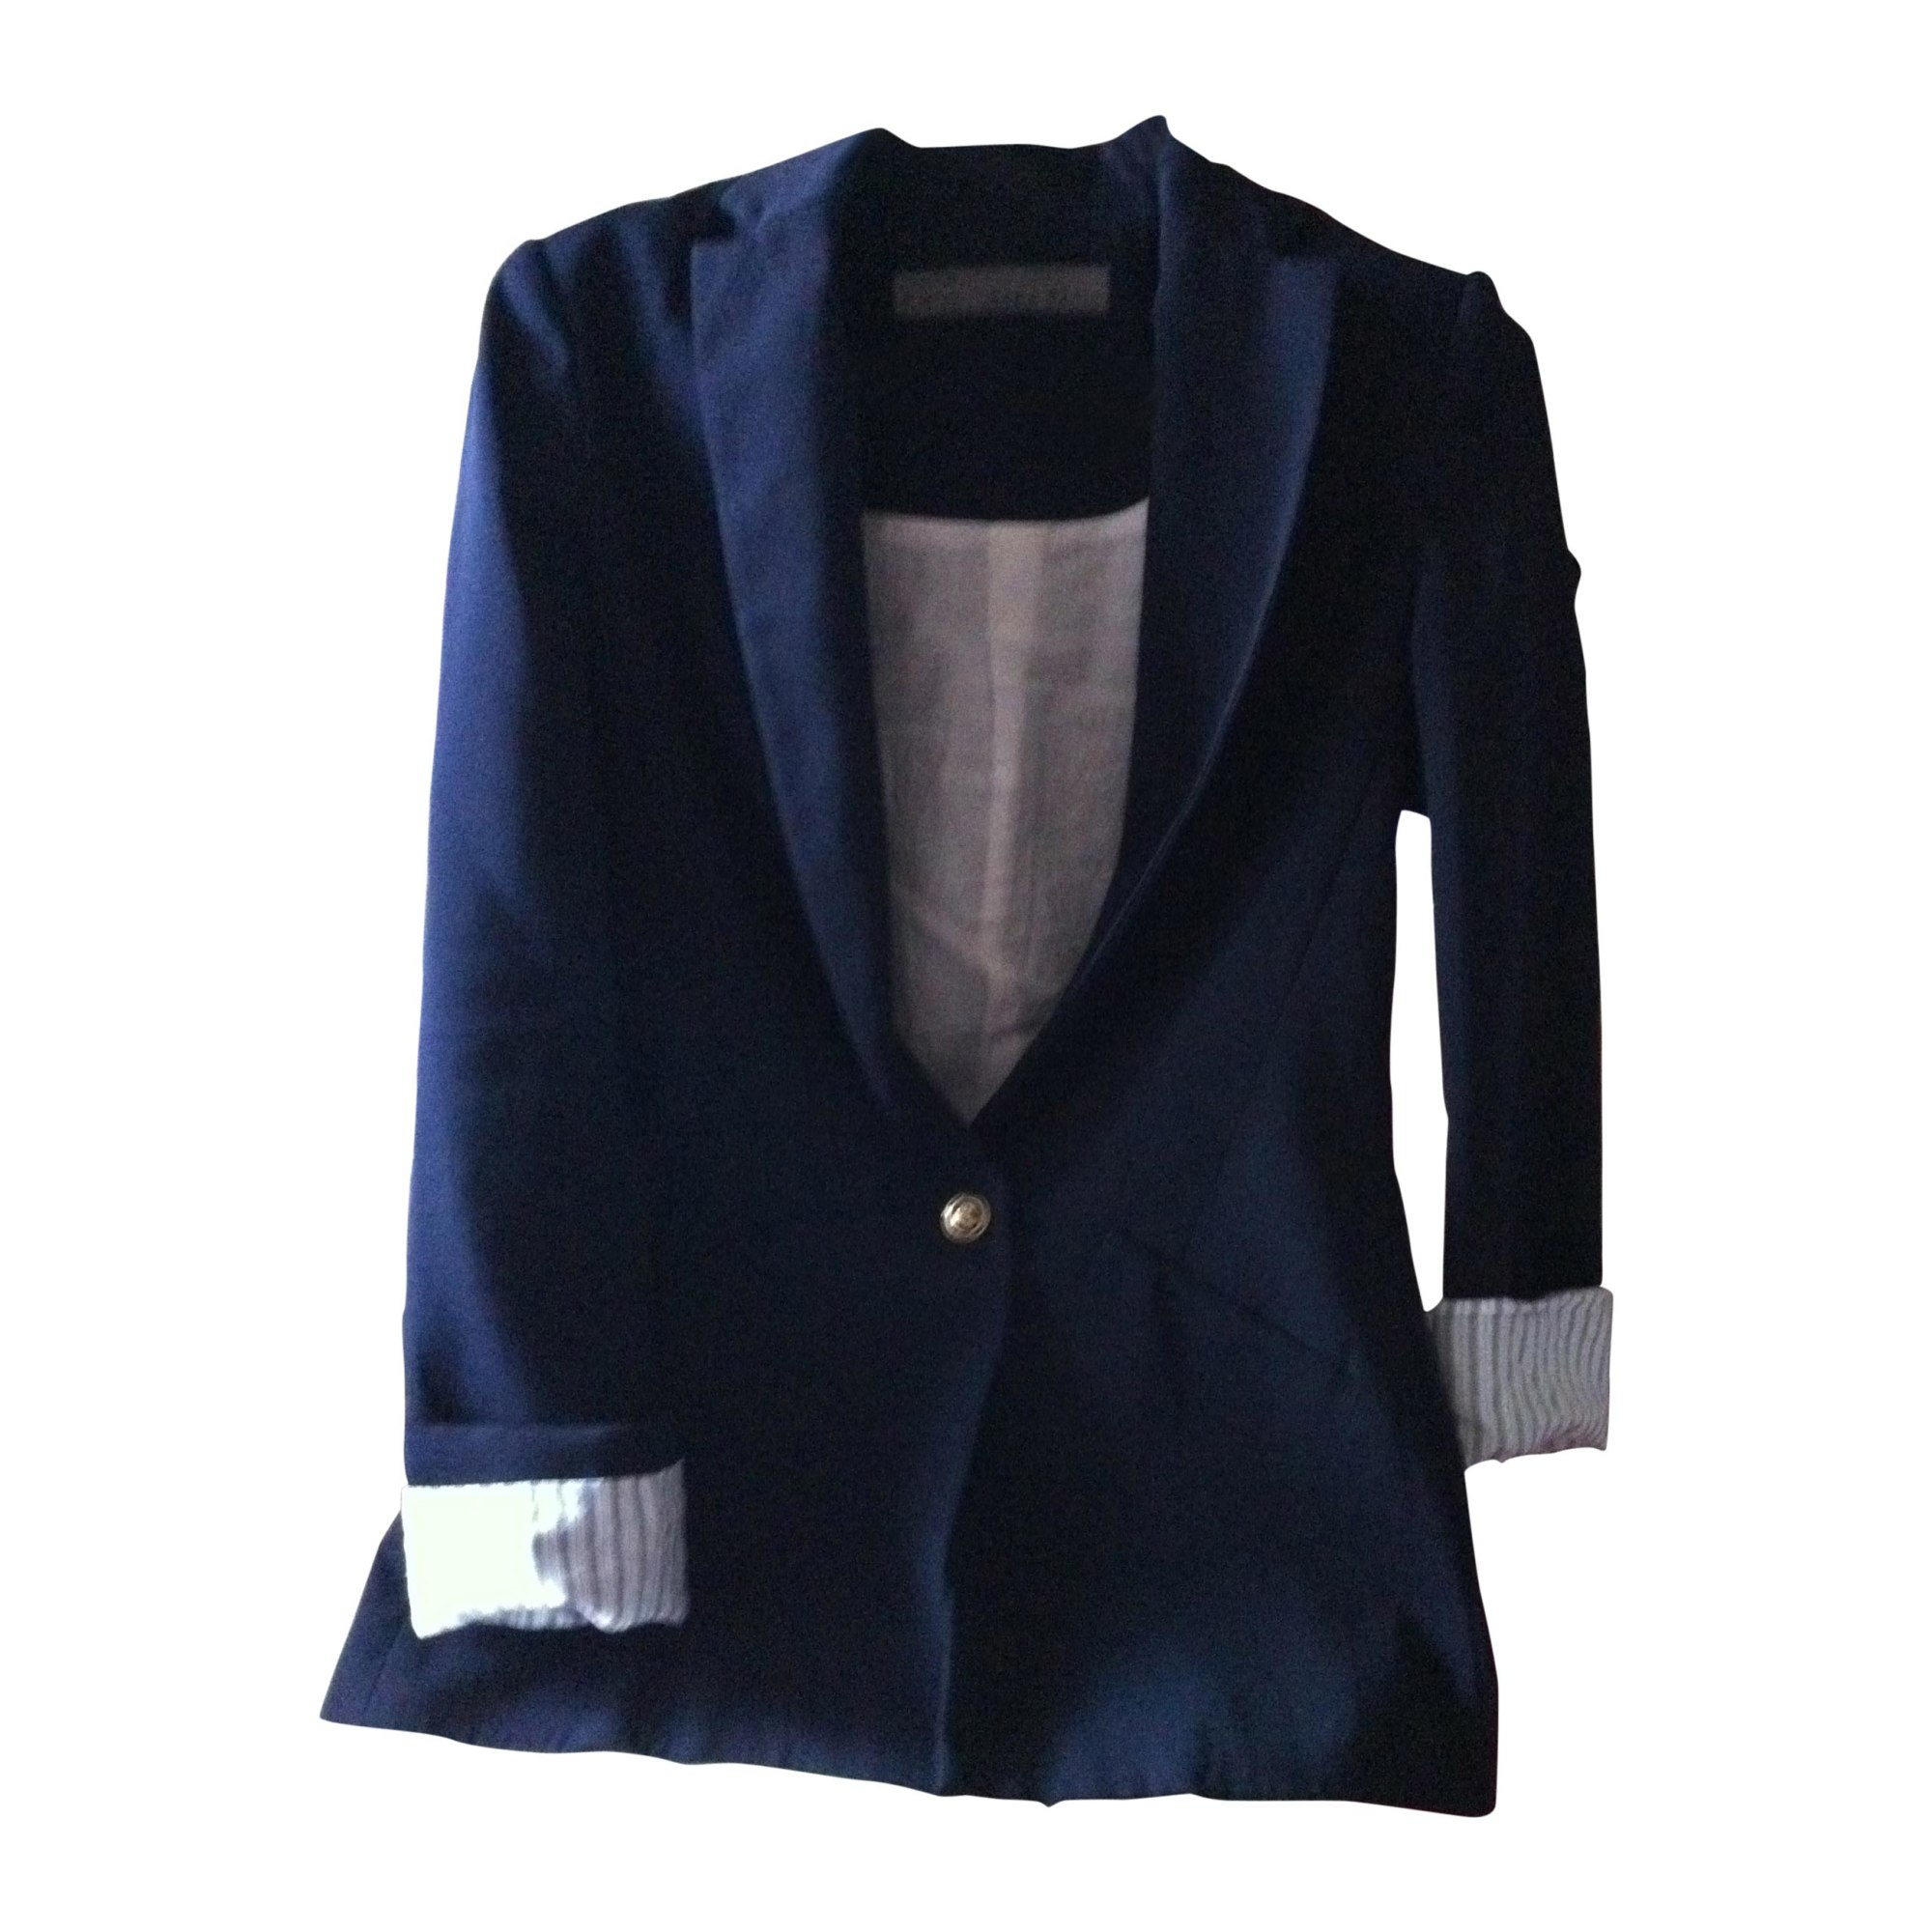 Zara Mode Femme Vetement Tailleur Et Veste Fitness EYqOAnAx